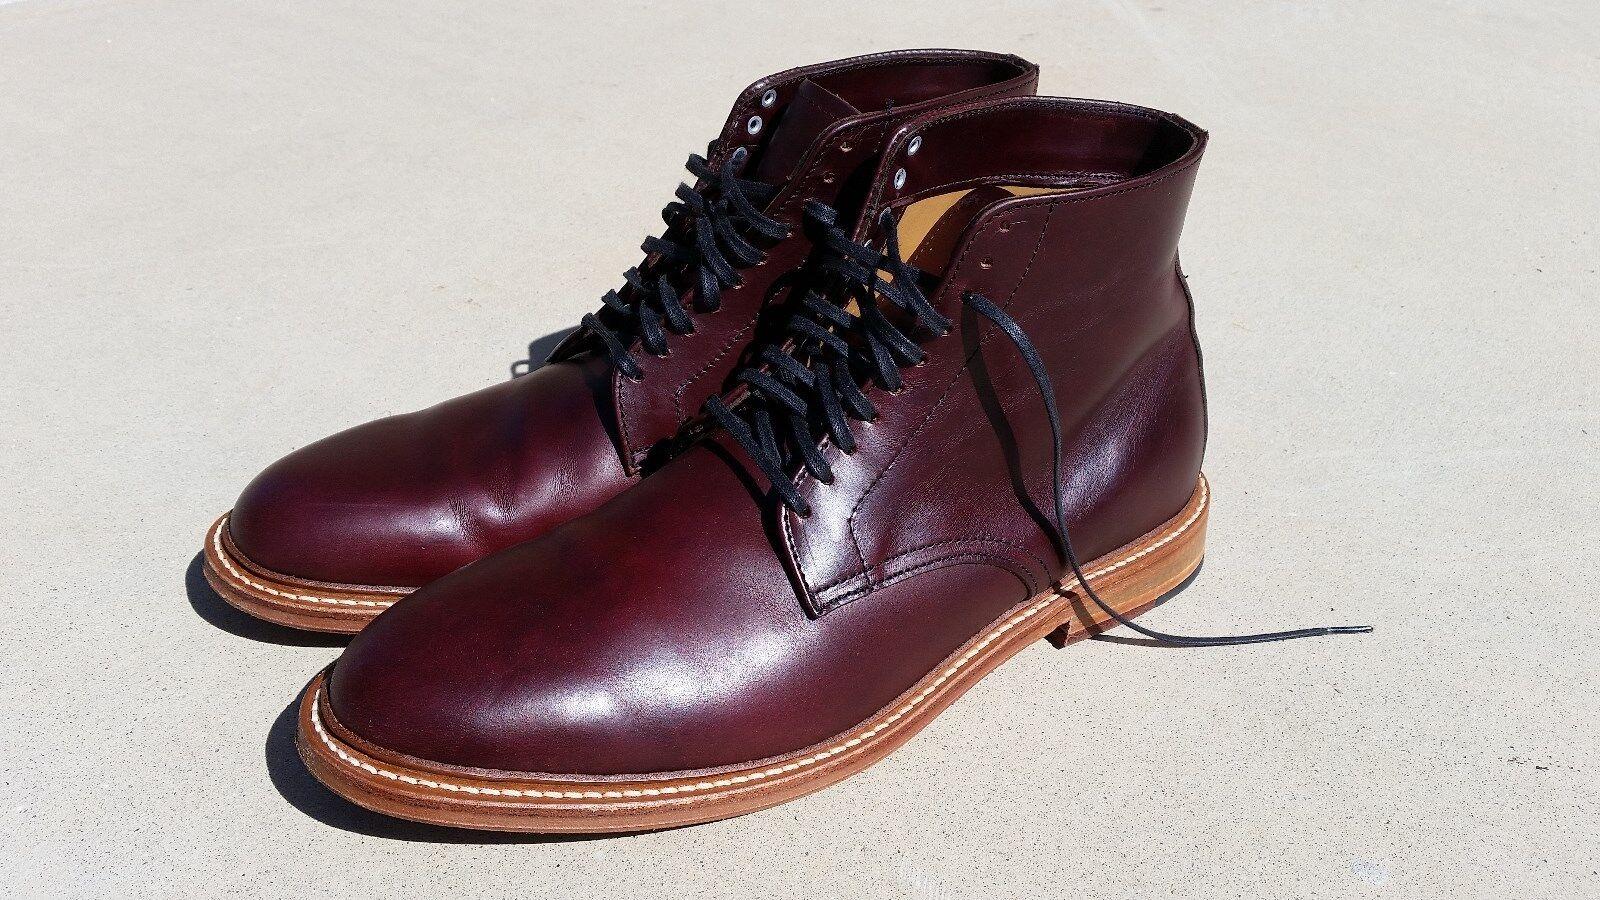 Oak Street Bootmakers Oxblood Lakeshore Boot size 11 D Excellent